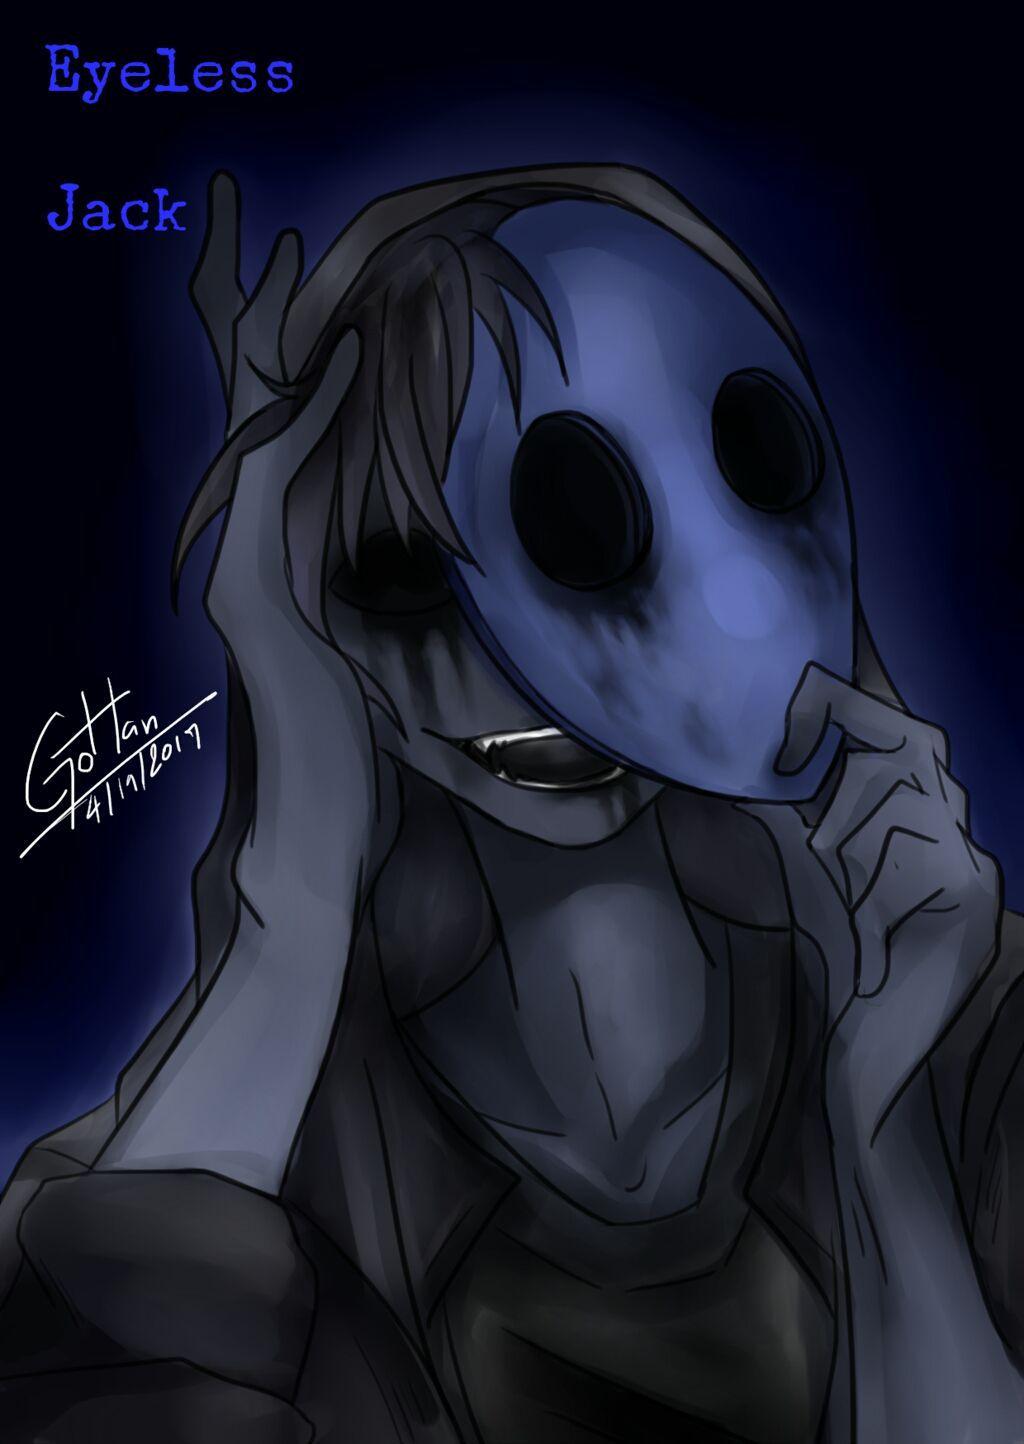 Xả ảnh Creepypasta Jack Creepypasta Creepypasta Cute Eyeless Jack